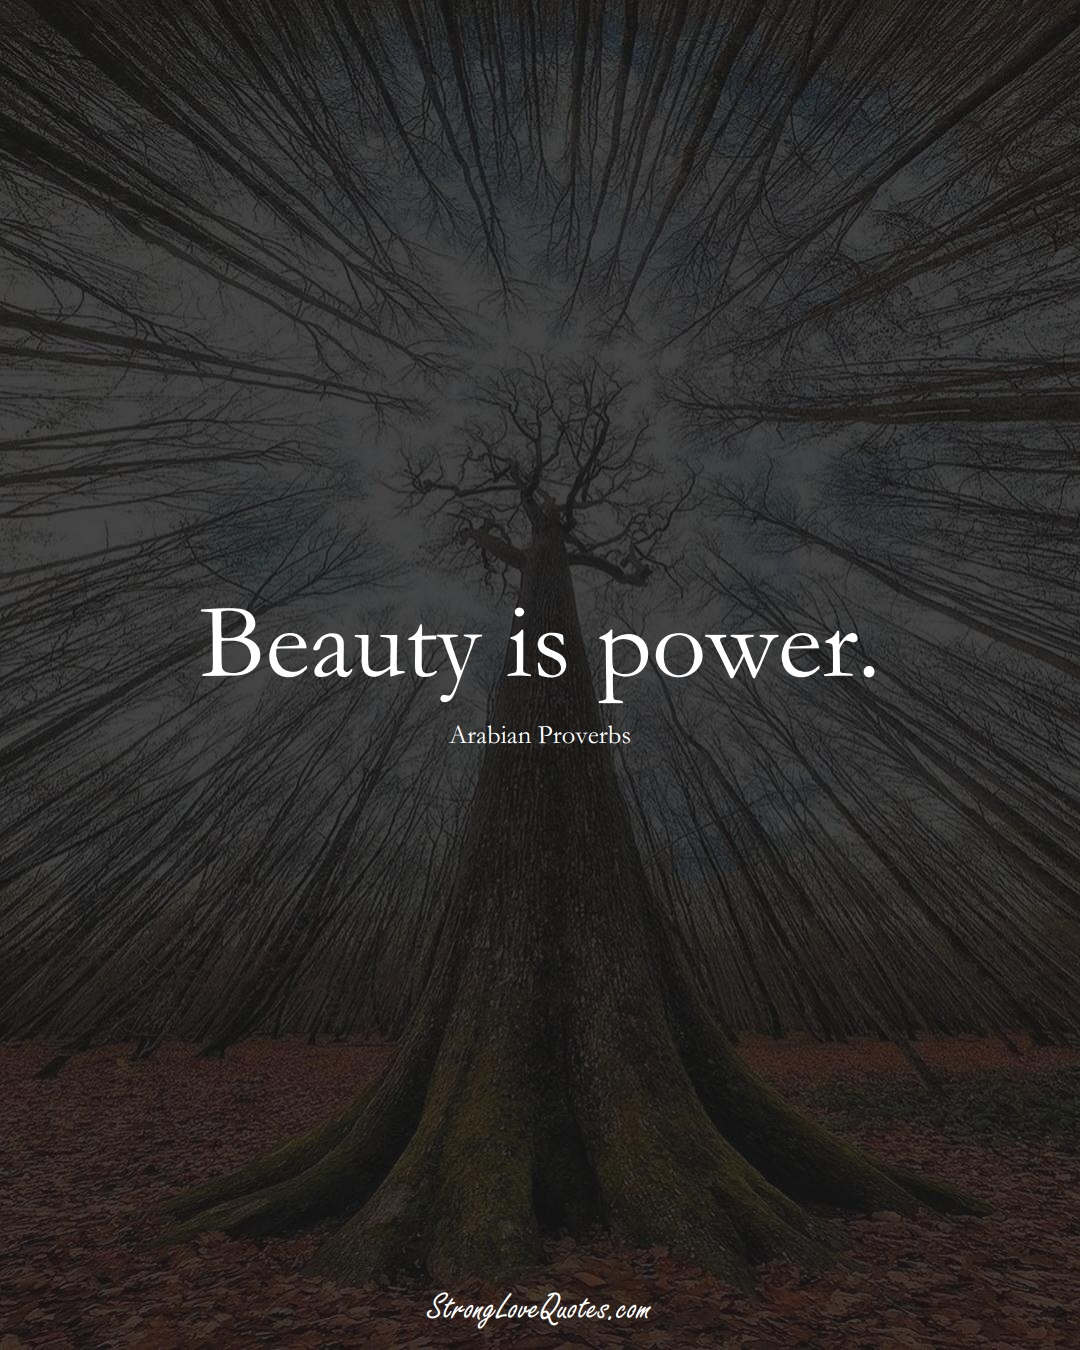 Beauty is power. (Arabian Sayings);  #aVarietyofCulturesSayings